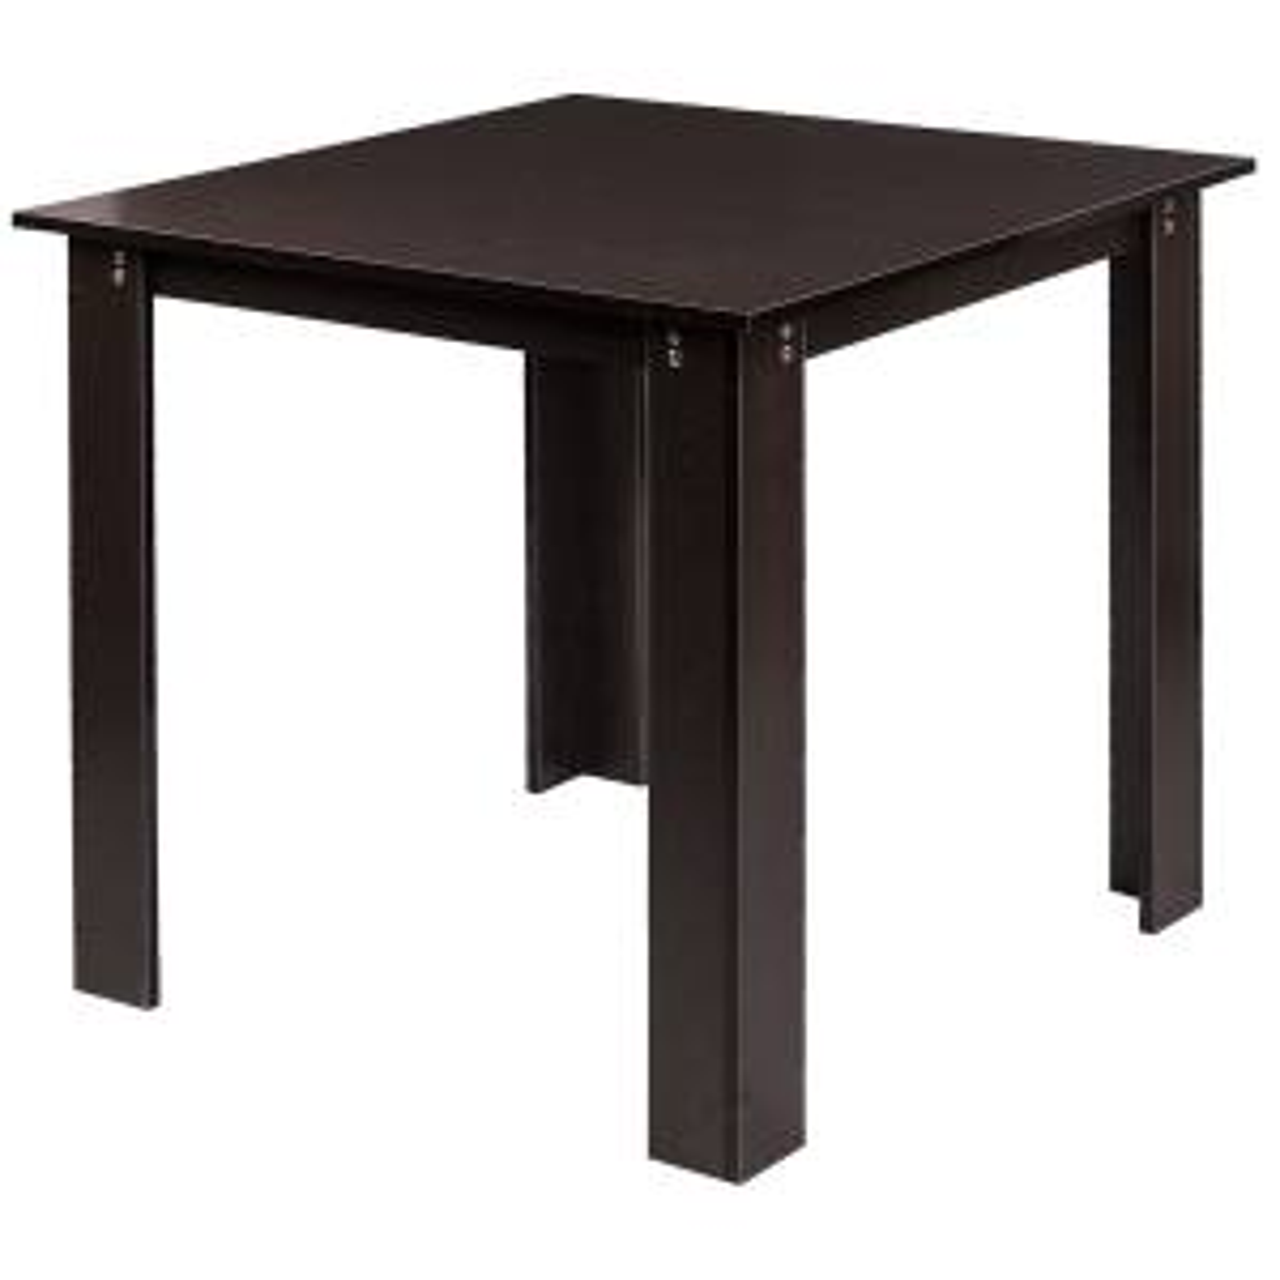 میز ناهار خوری صنایع چوب قائم کد K200 سایز 80 × 80